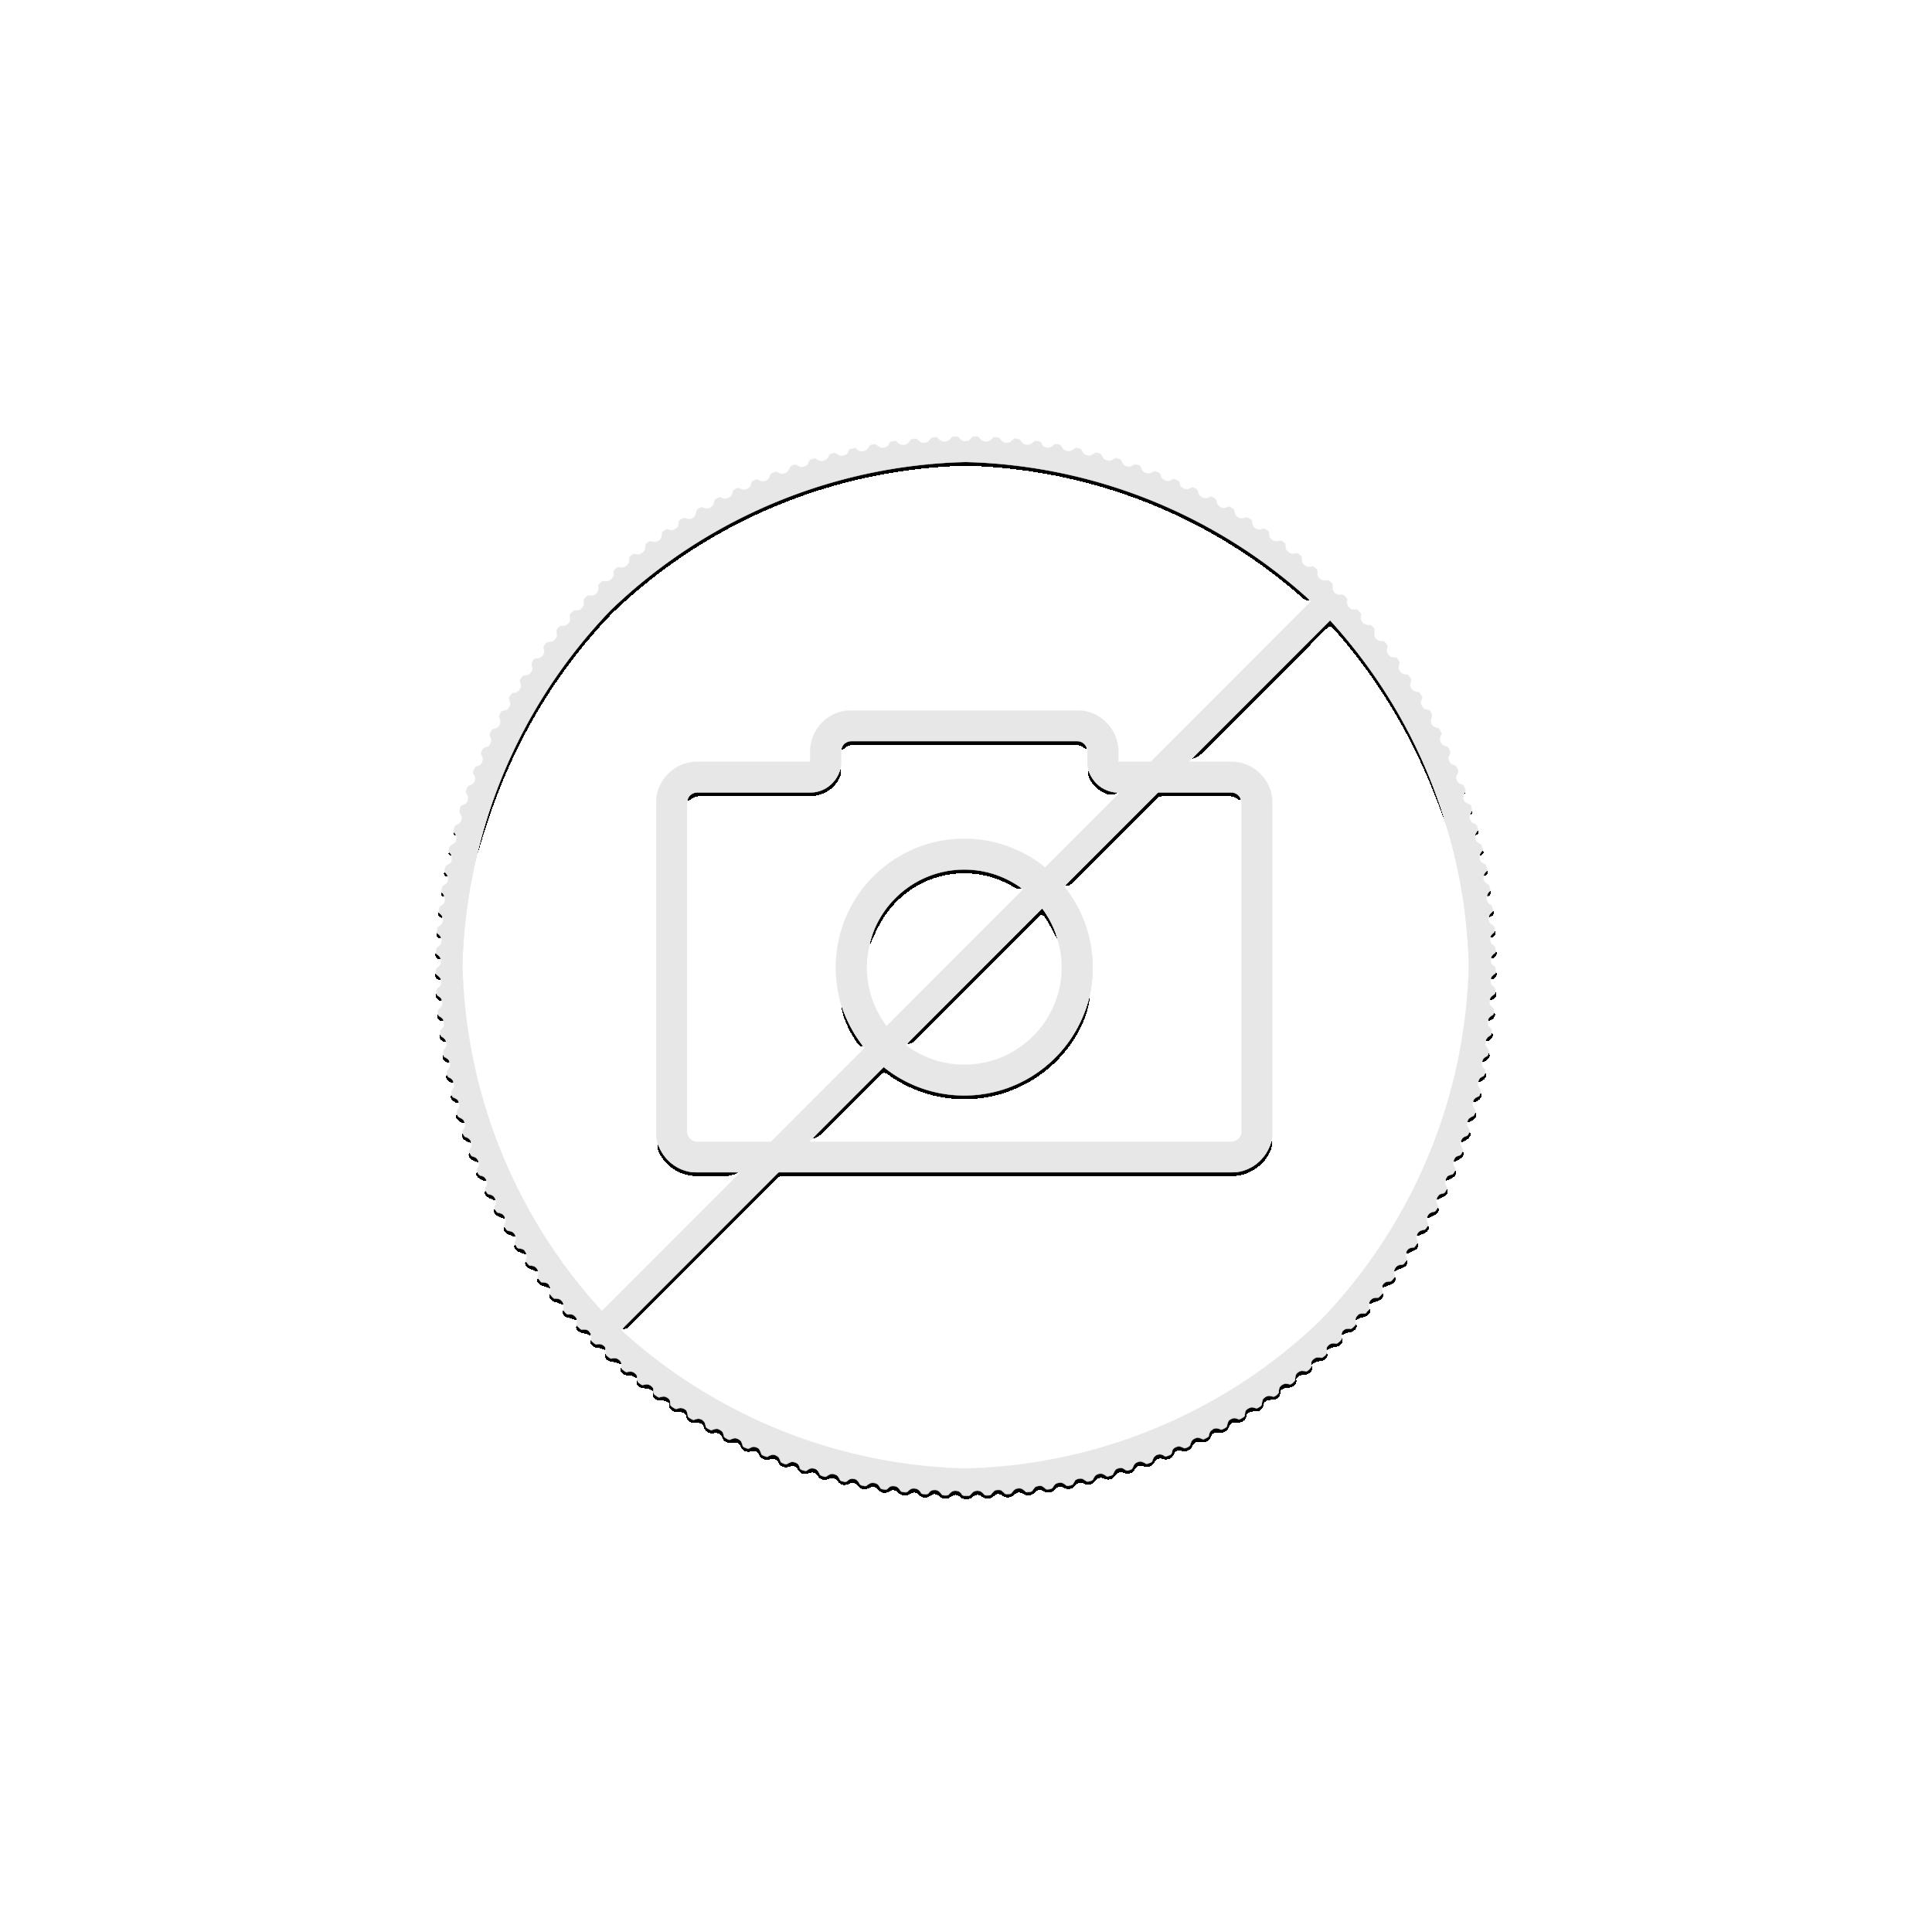 2 troy ounce zilveren munt Samoa Hygieia Piedfort - antieke afwerking 2020